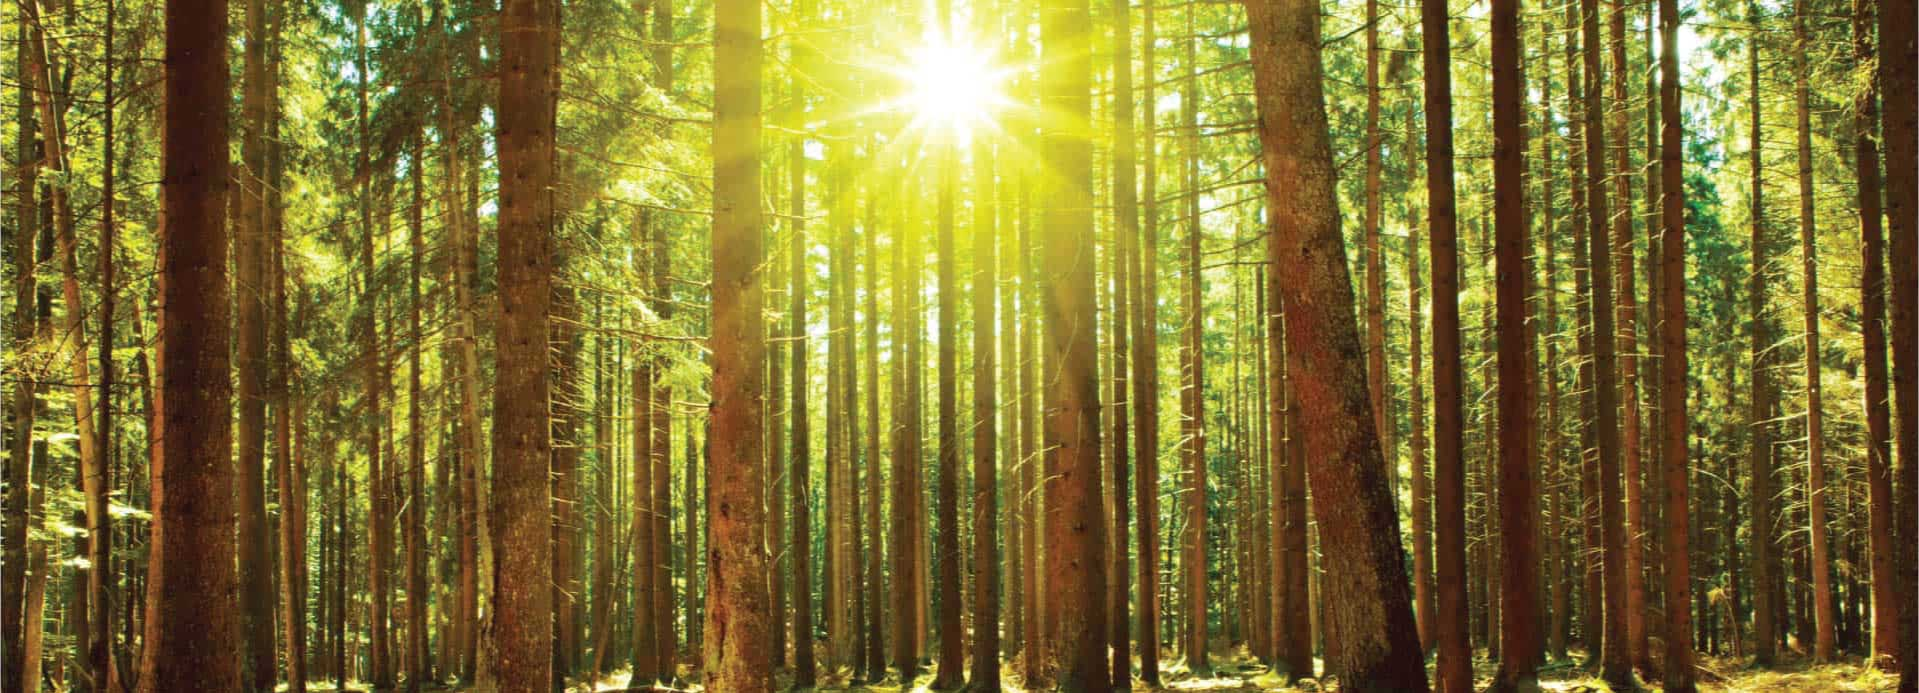 sun-forest-opt_02